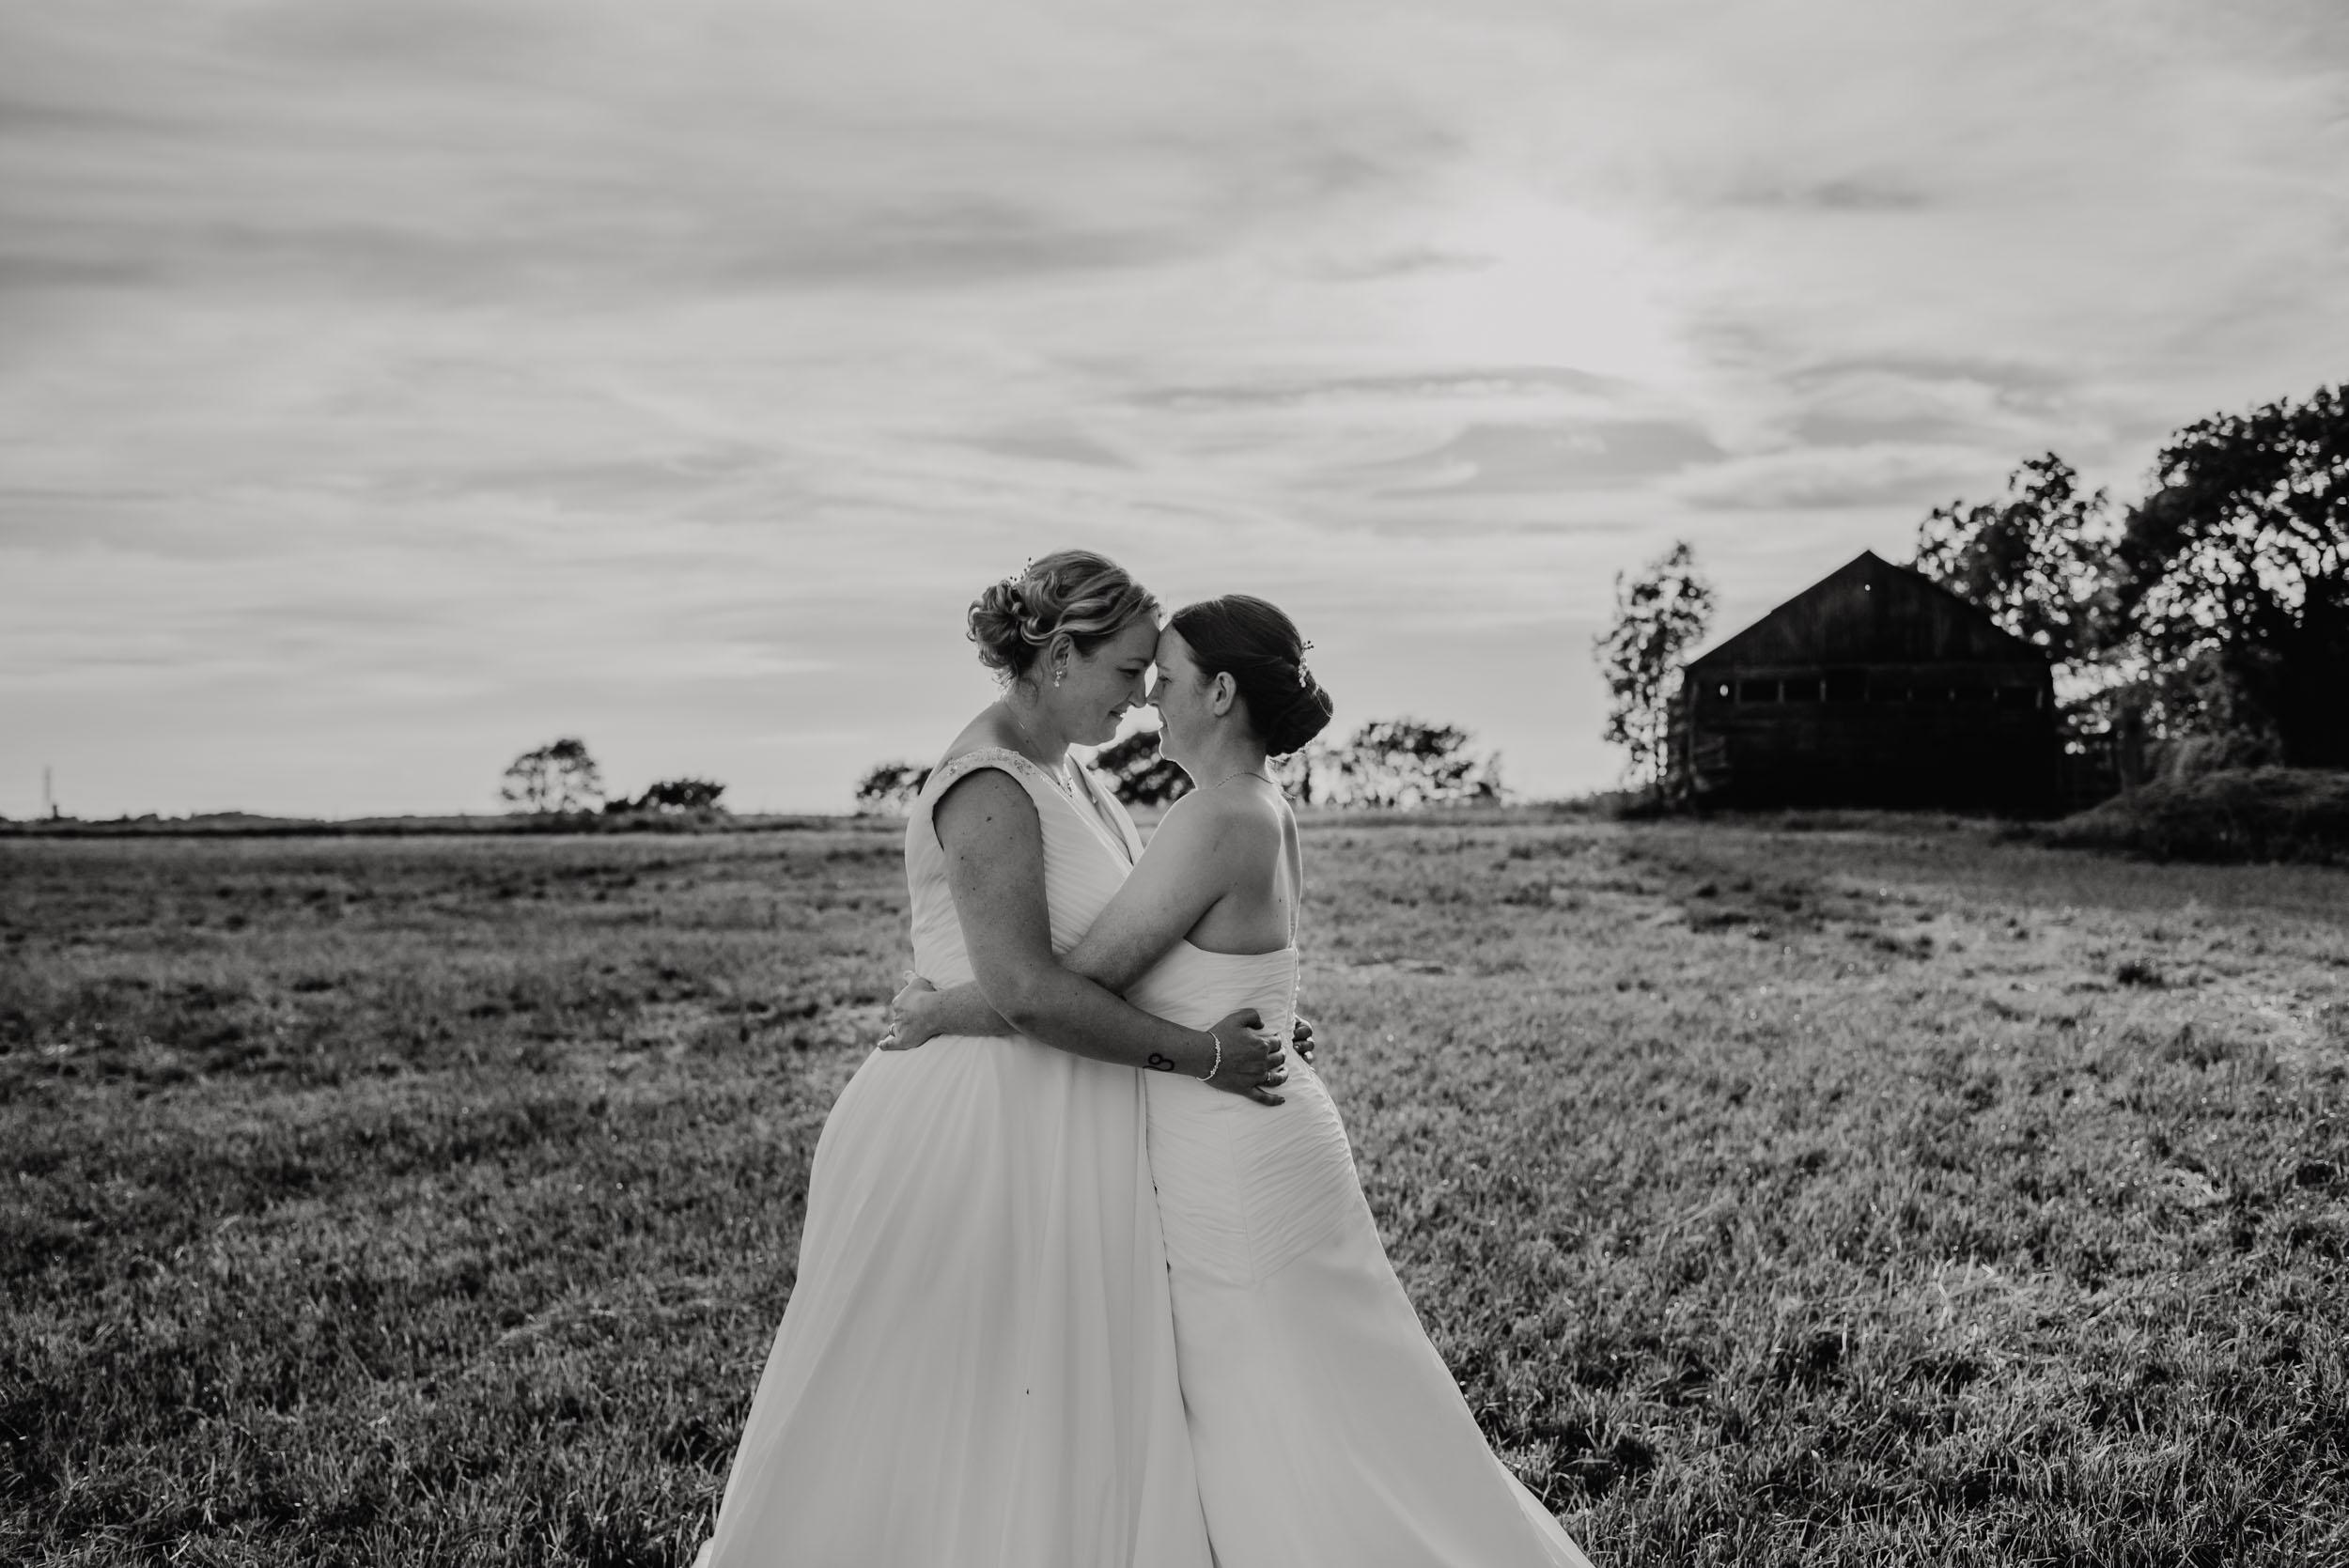 Donington-park-farm-wedding-photography-696.jpg